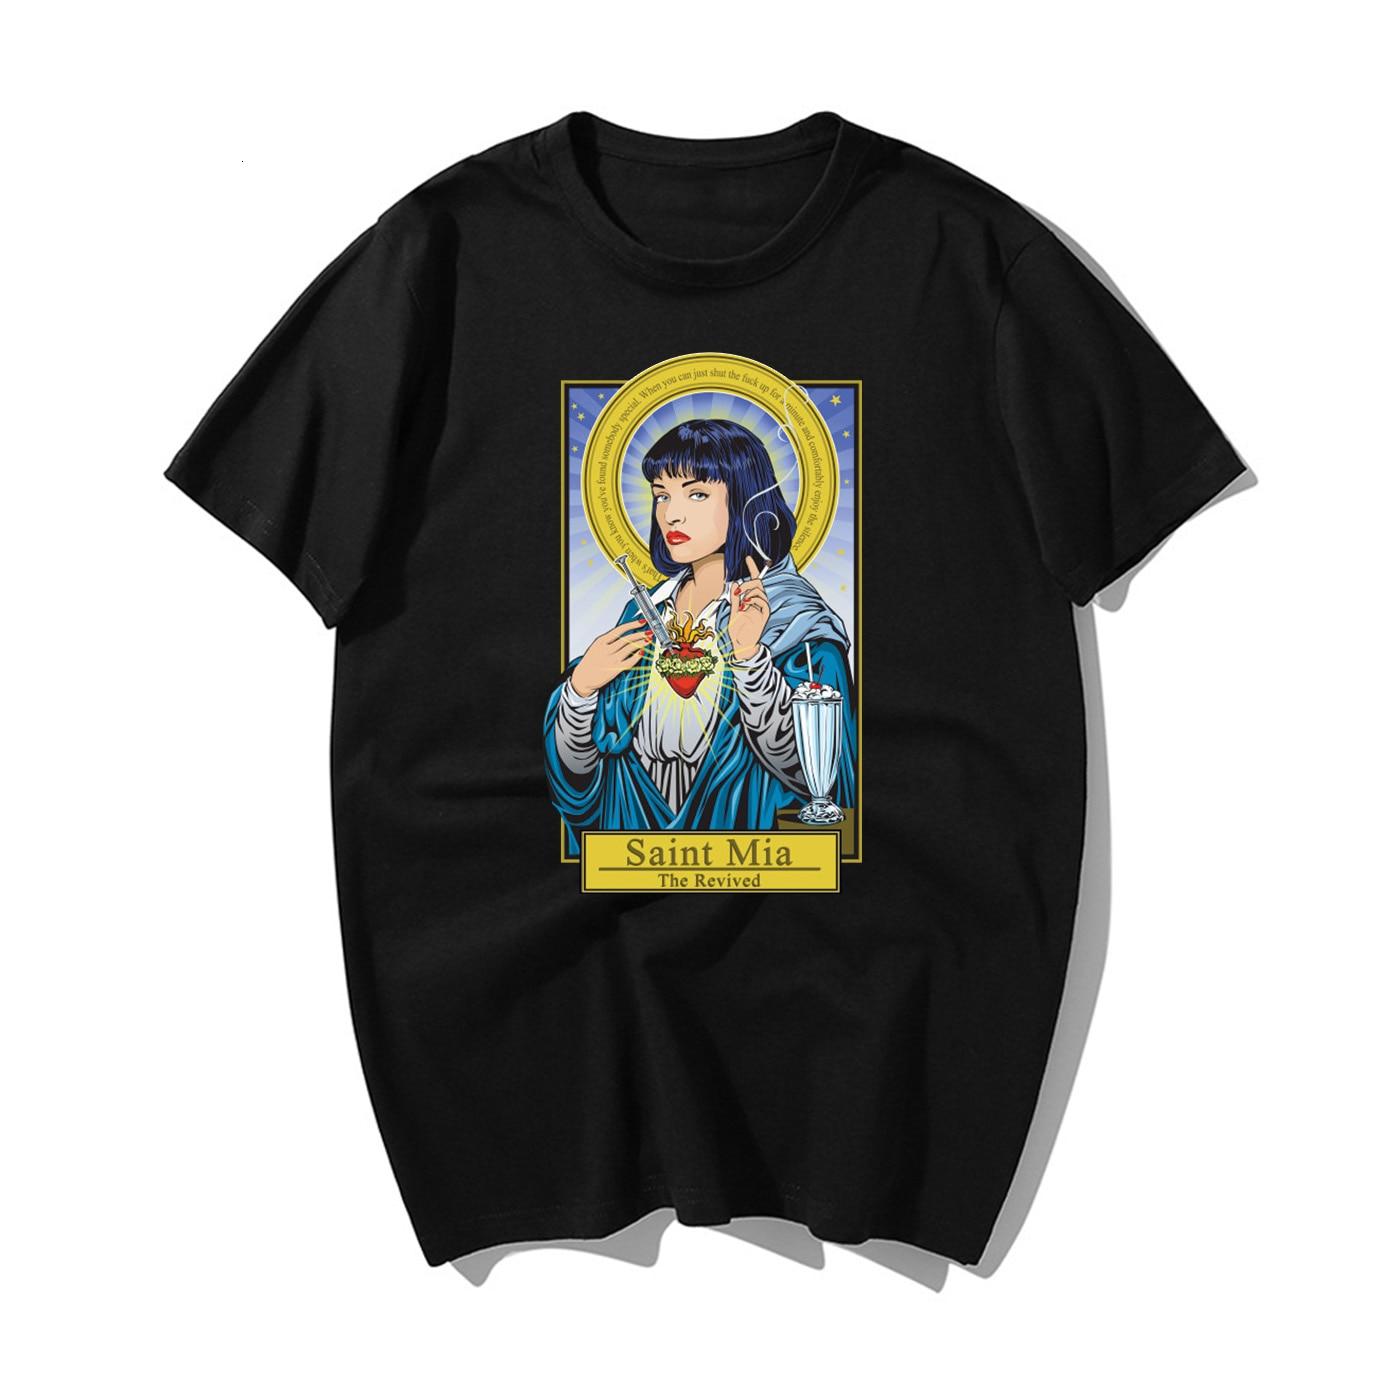 Fictional Goddess T shirt man Gothic Tumblr Harajuku Kawaii Aesthetic Plus Size Short Sleeve Cotton Top Tees Tee t Shirt men|T-Shirts| - AliExpress